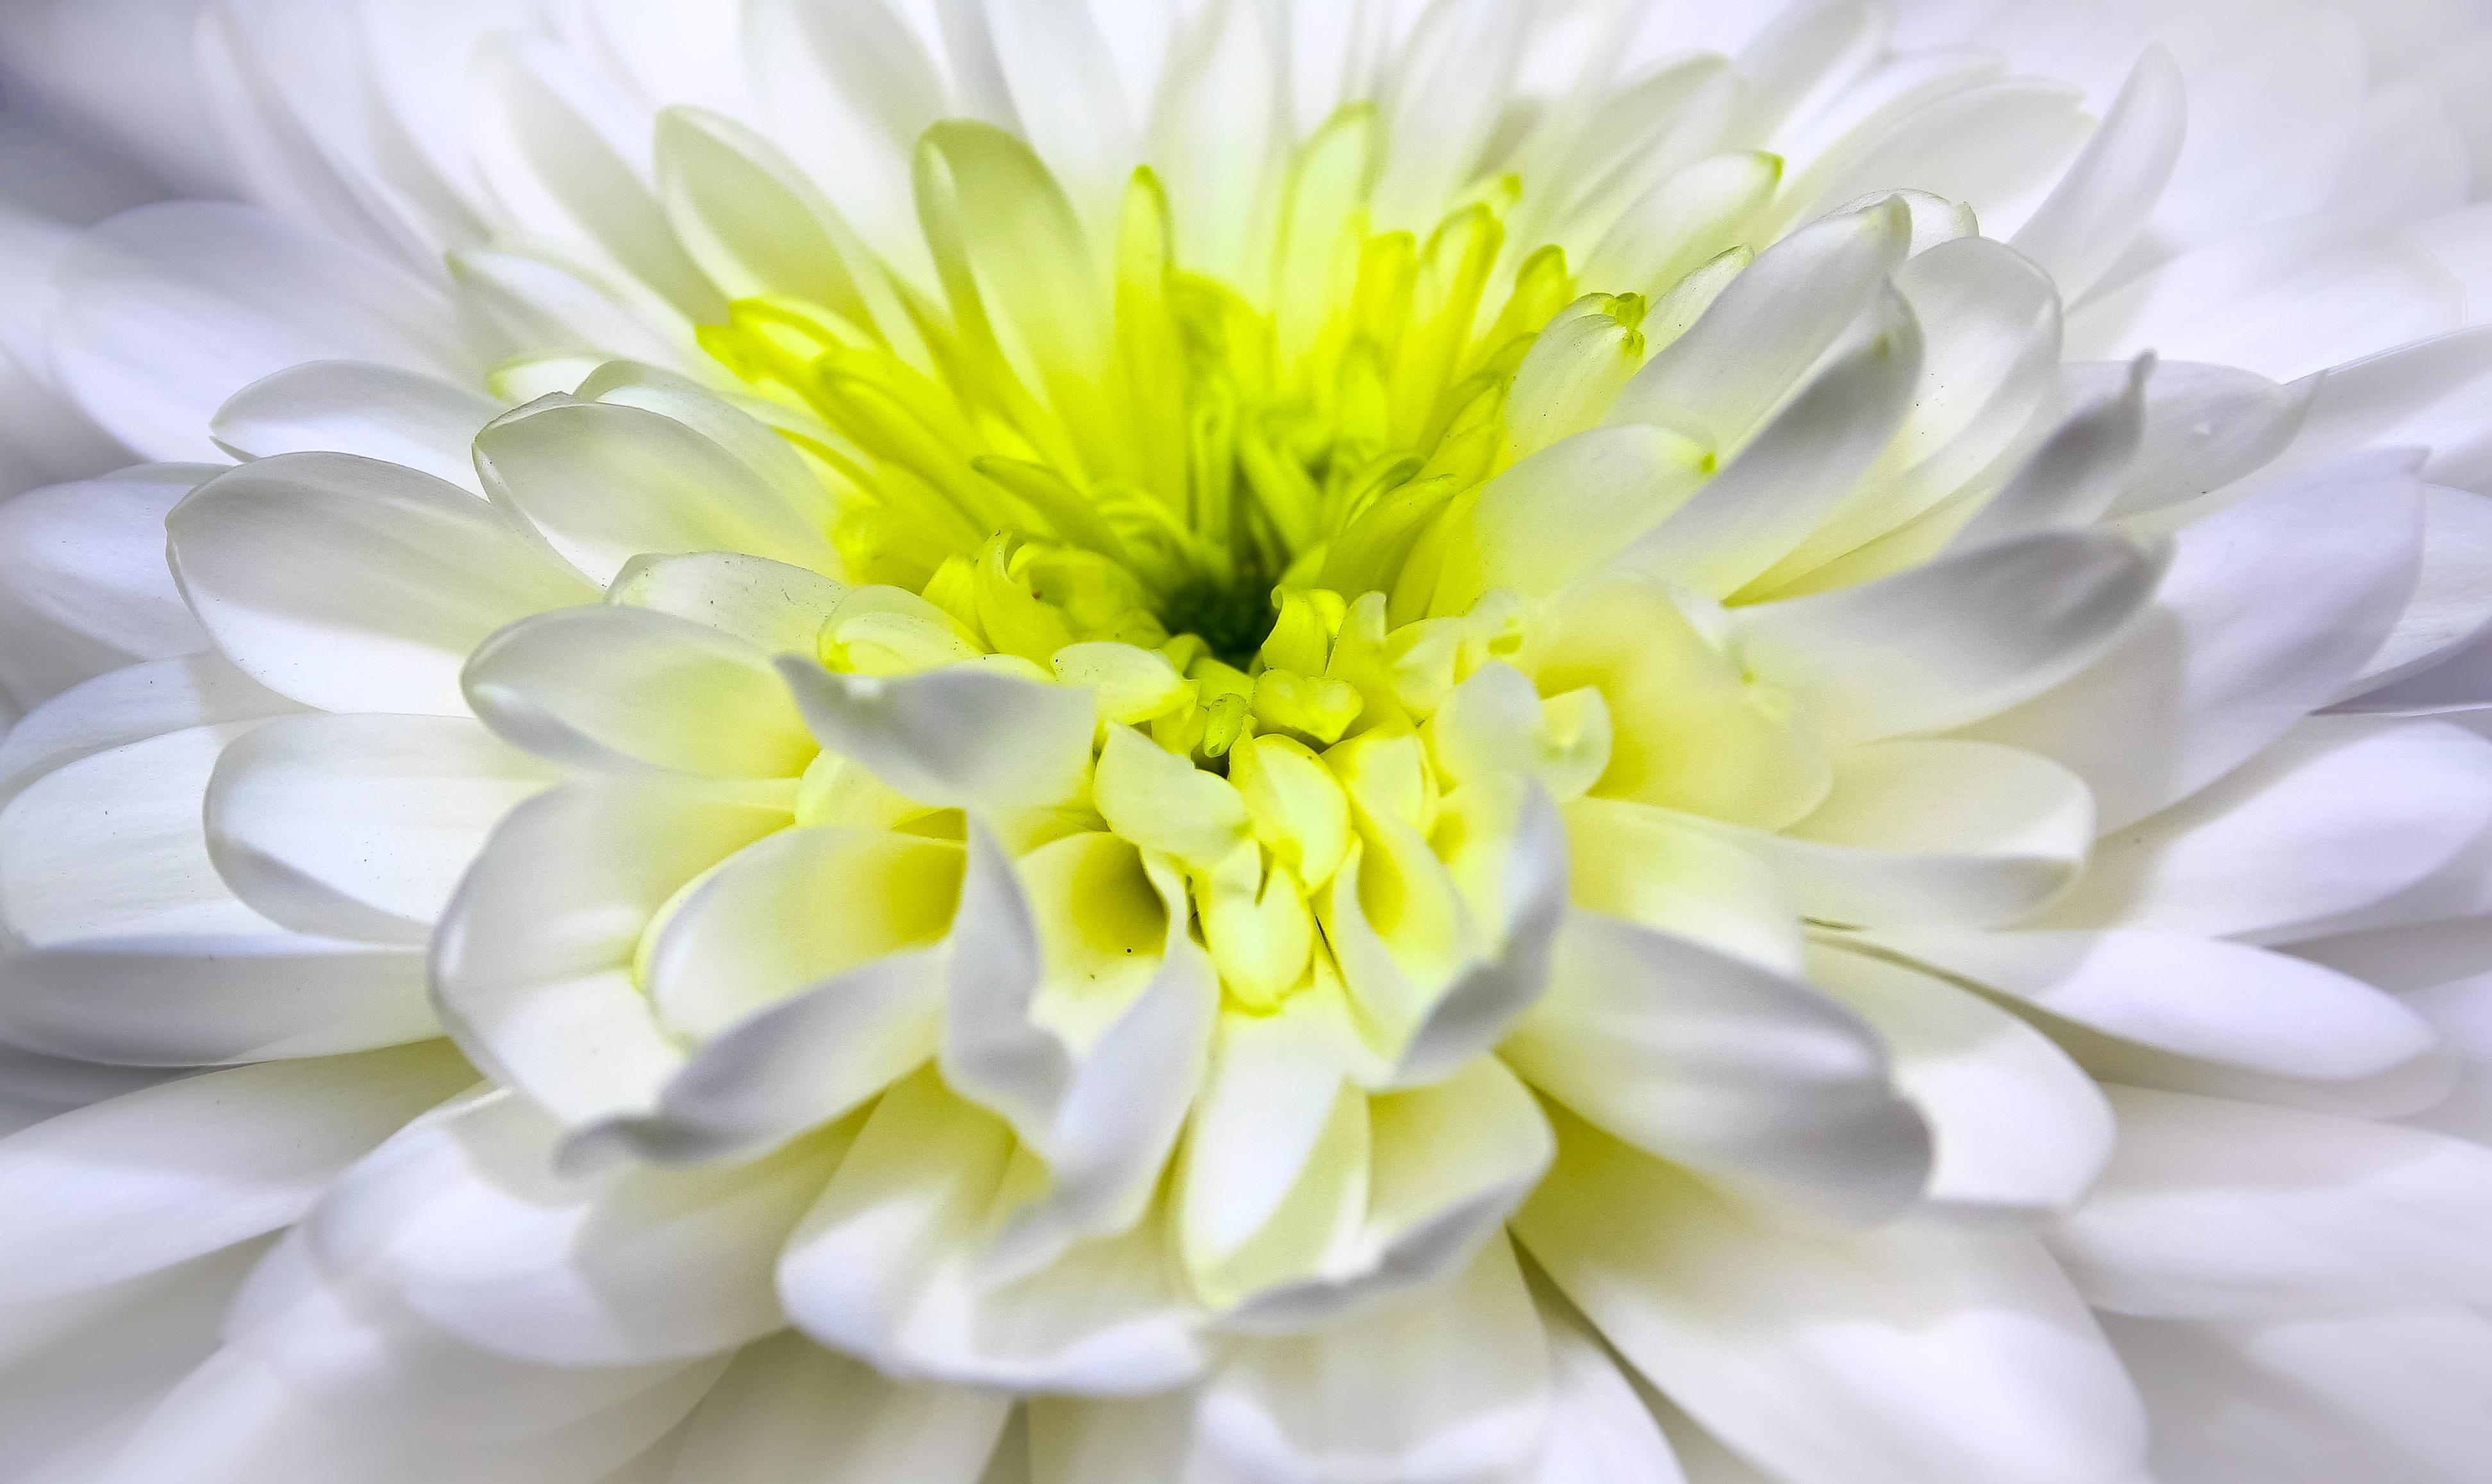 Free images nature blossom white flower petal bloom summer free images nature blossom white flower petal bloom summer yellow garden flora close up dahlia chrysanthemum spring flowers mightylinksfo